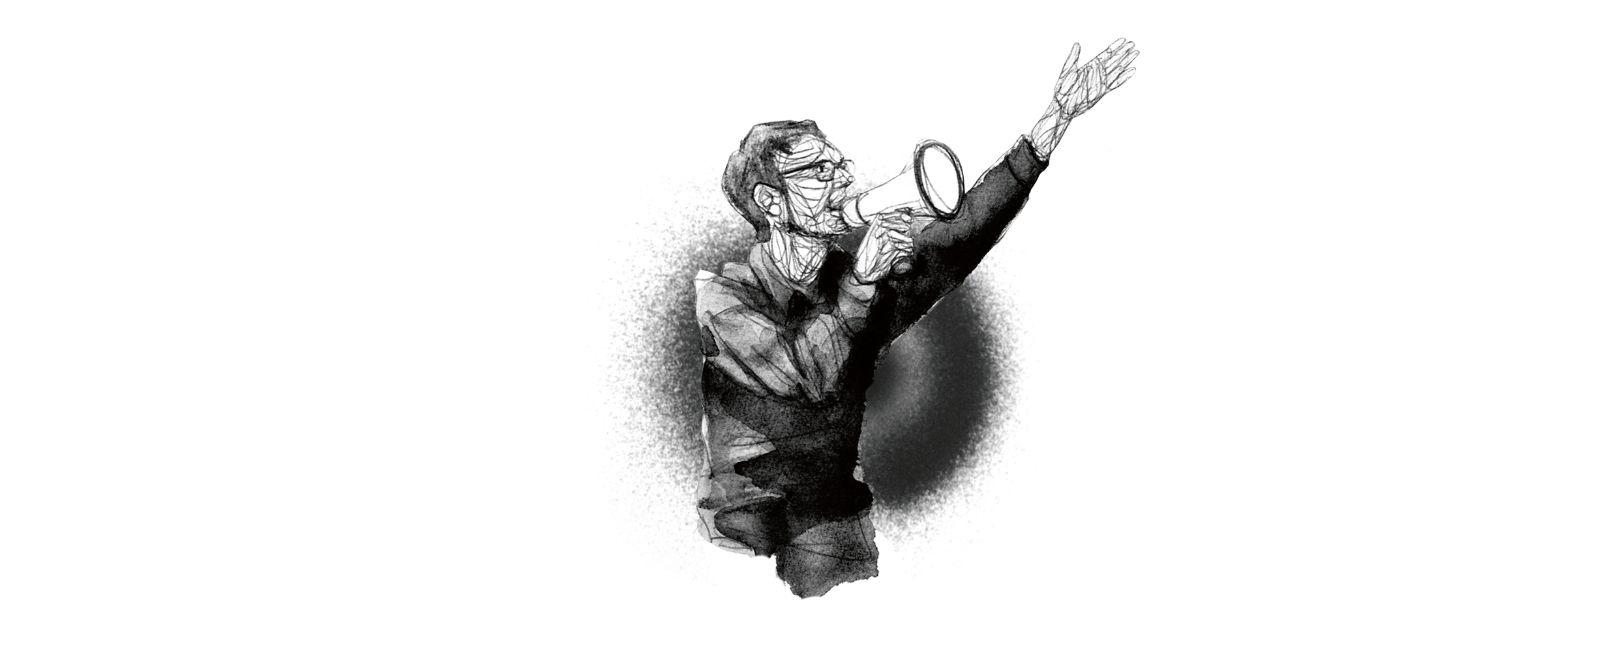 Team Junges Theater // Michael Kaiser //  2019 // Illustration: Michael Genter